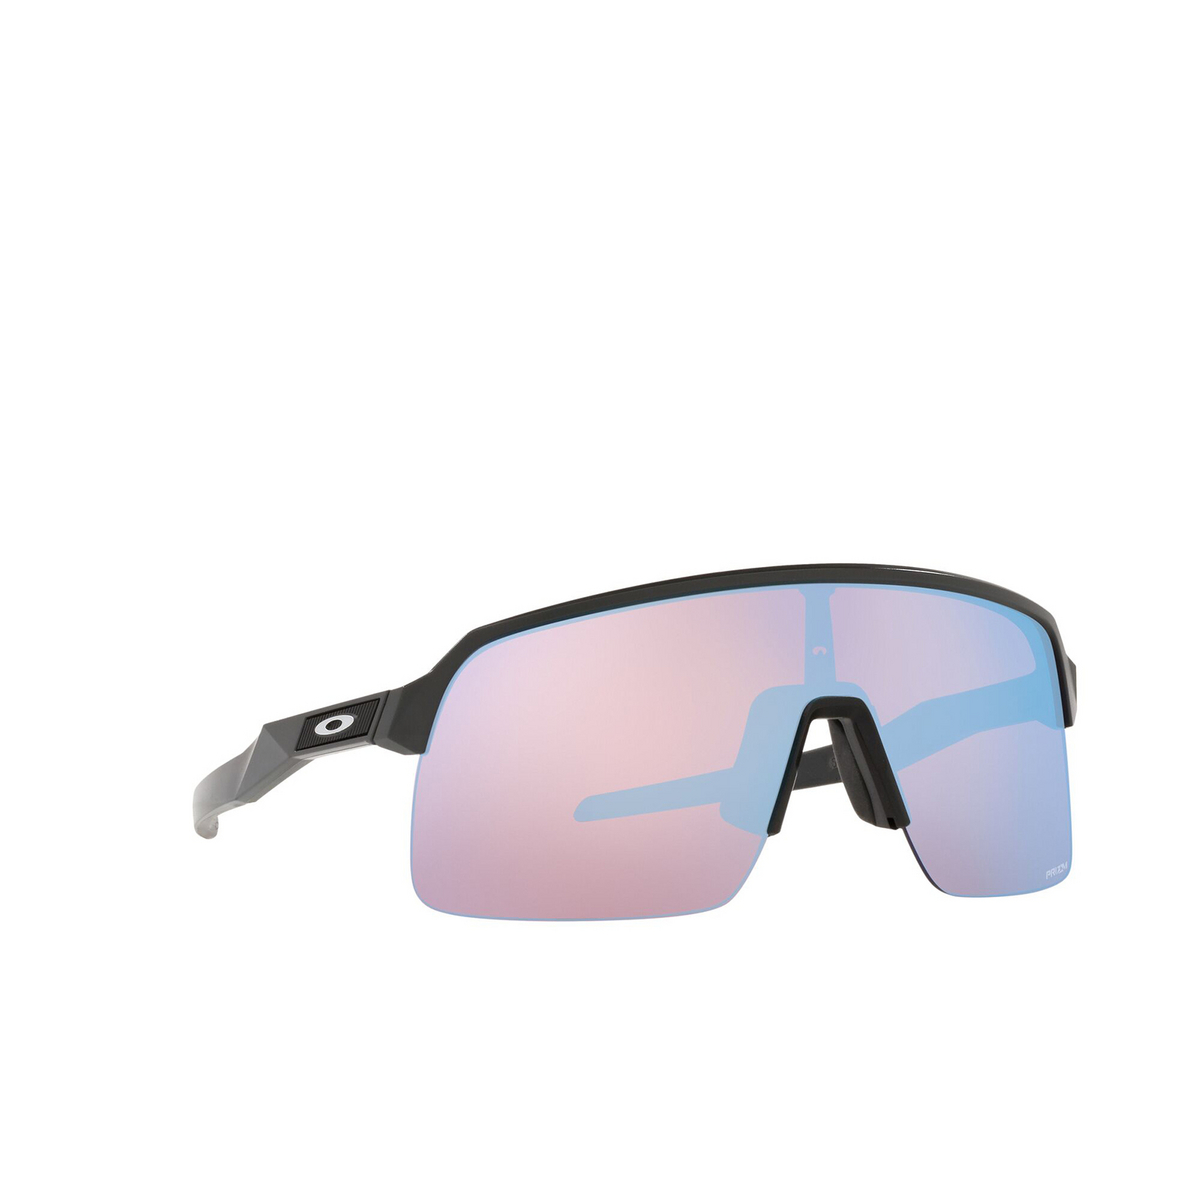 Oakley® Rectangle Sunglasses: Sutro Lite OO9463 color Matte Carbon 946317 - three-quarters view.